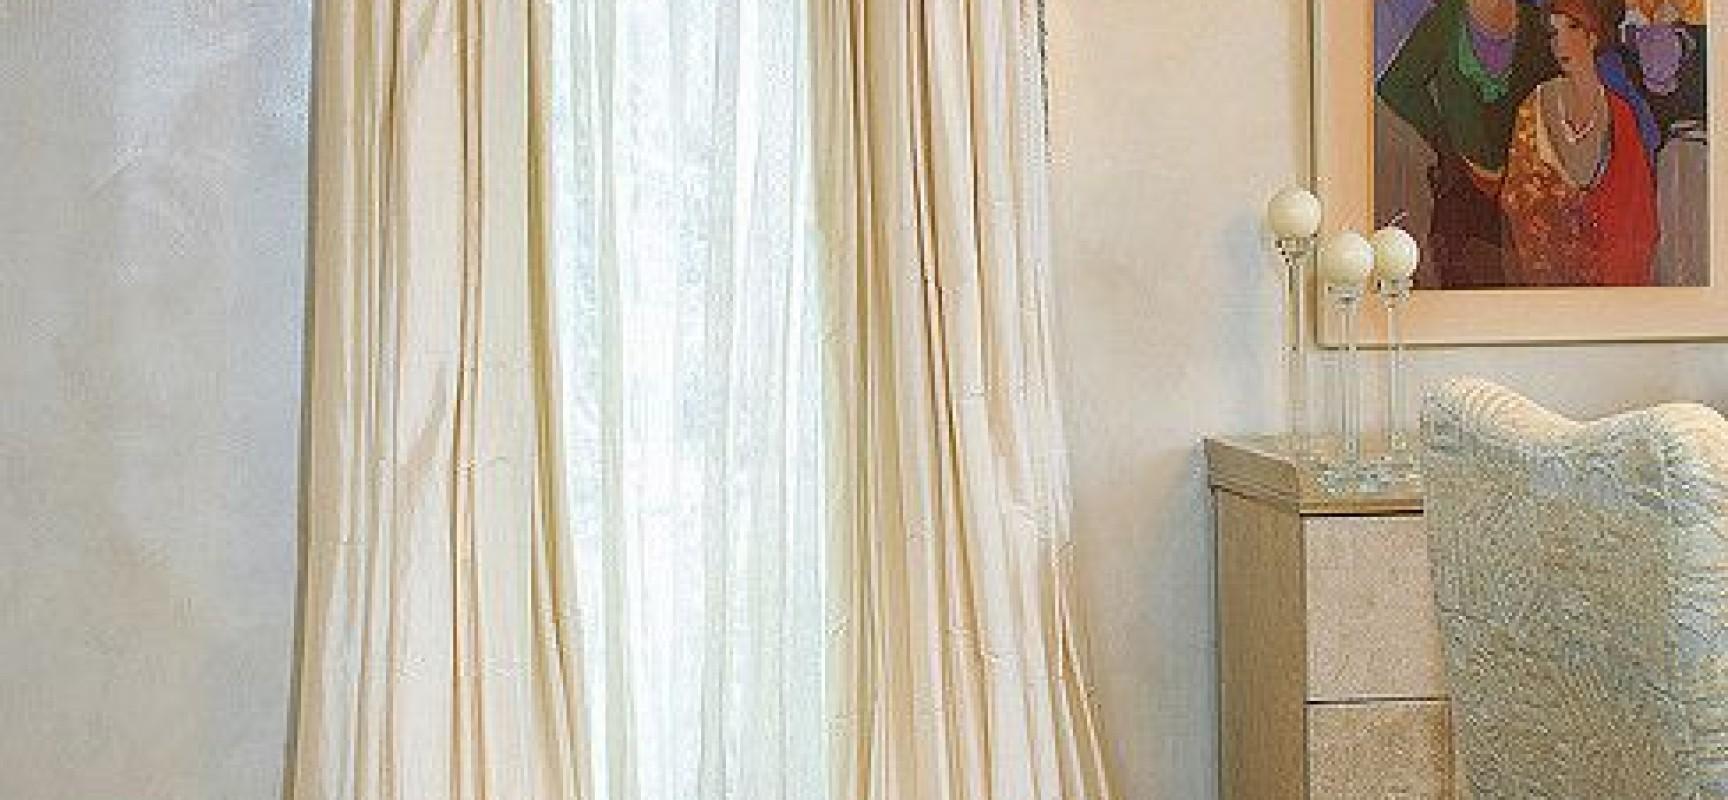 Como elegir las cortinas para la casa curso de organizacion de hogar aprenda a ser organizado - Como elegir cortinas ...